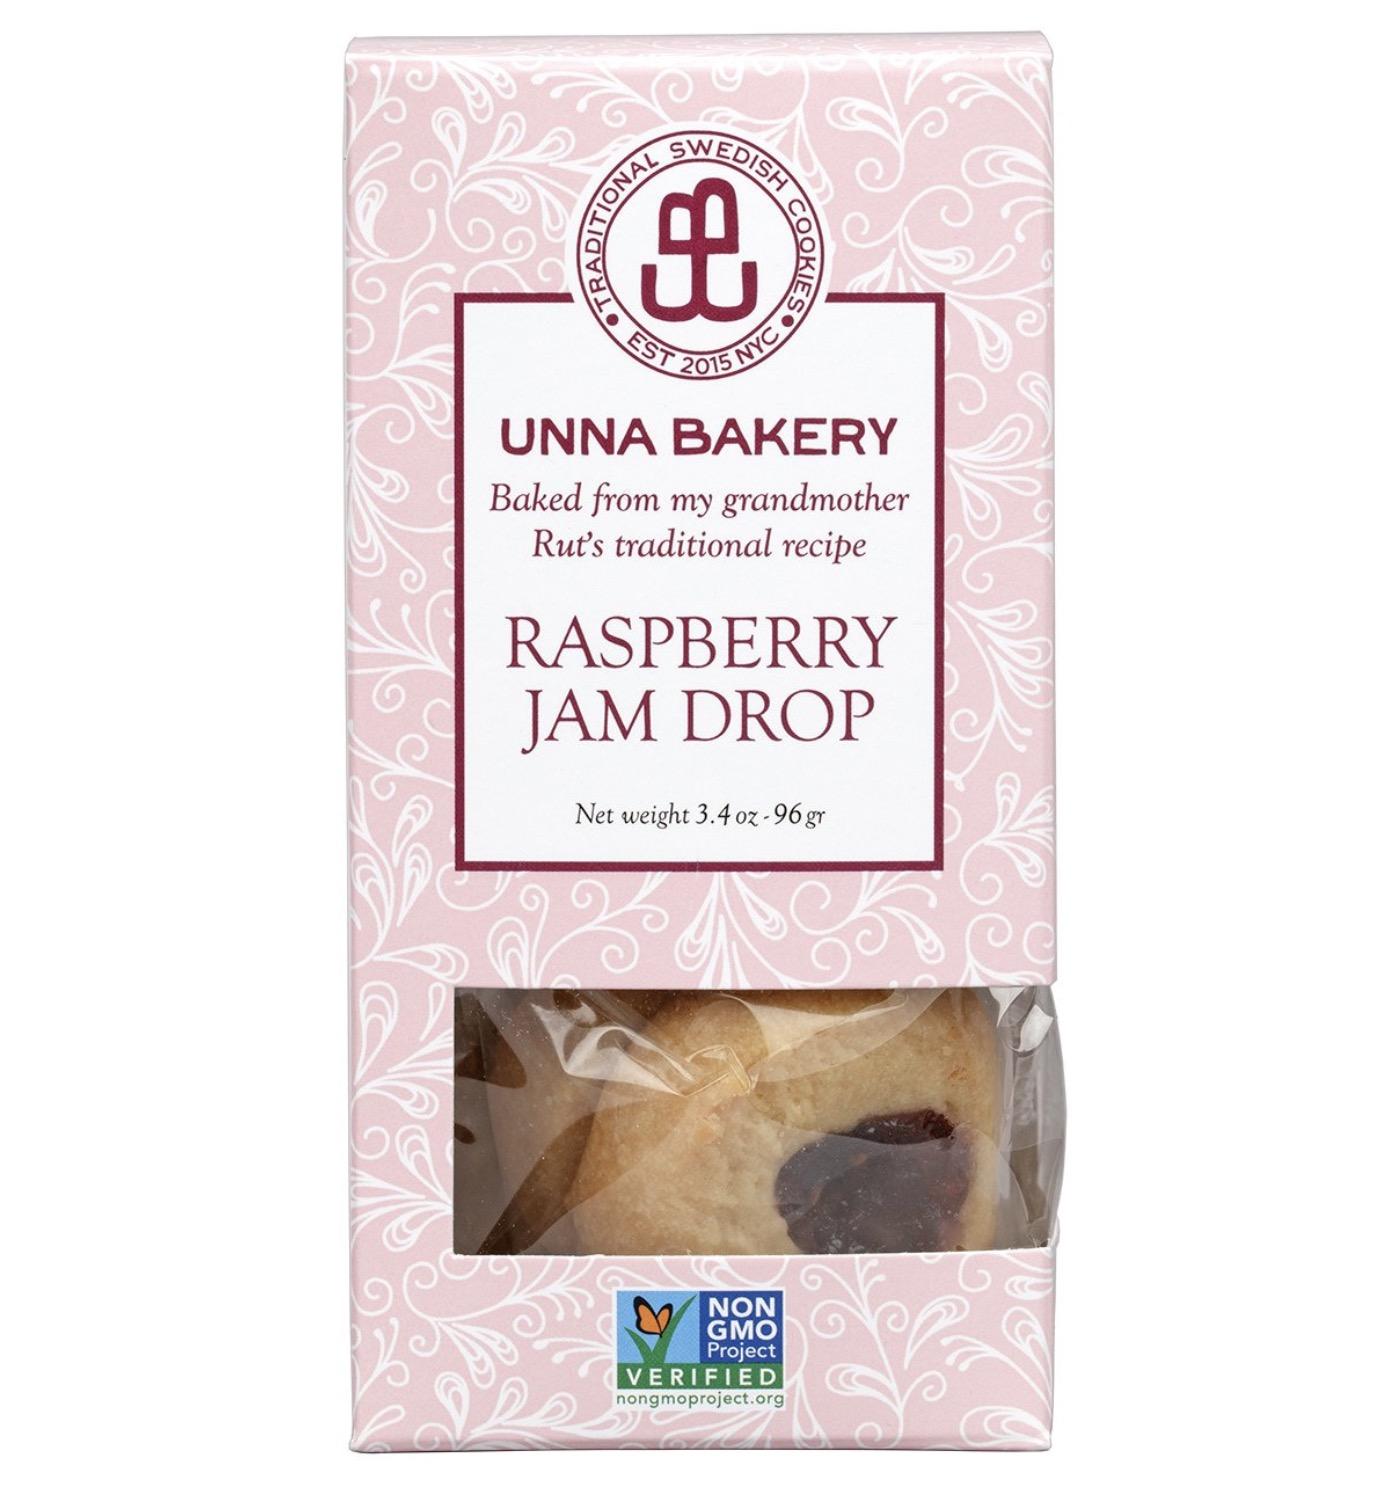 Unna Bakery Cookies, $6